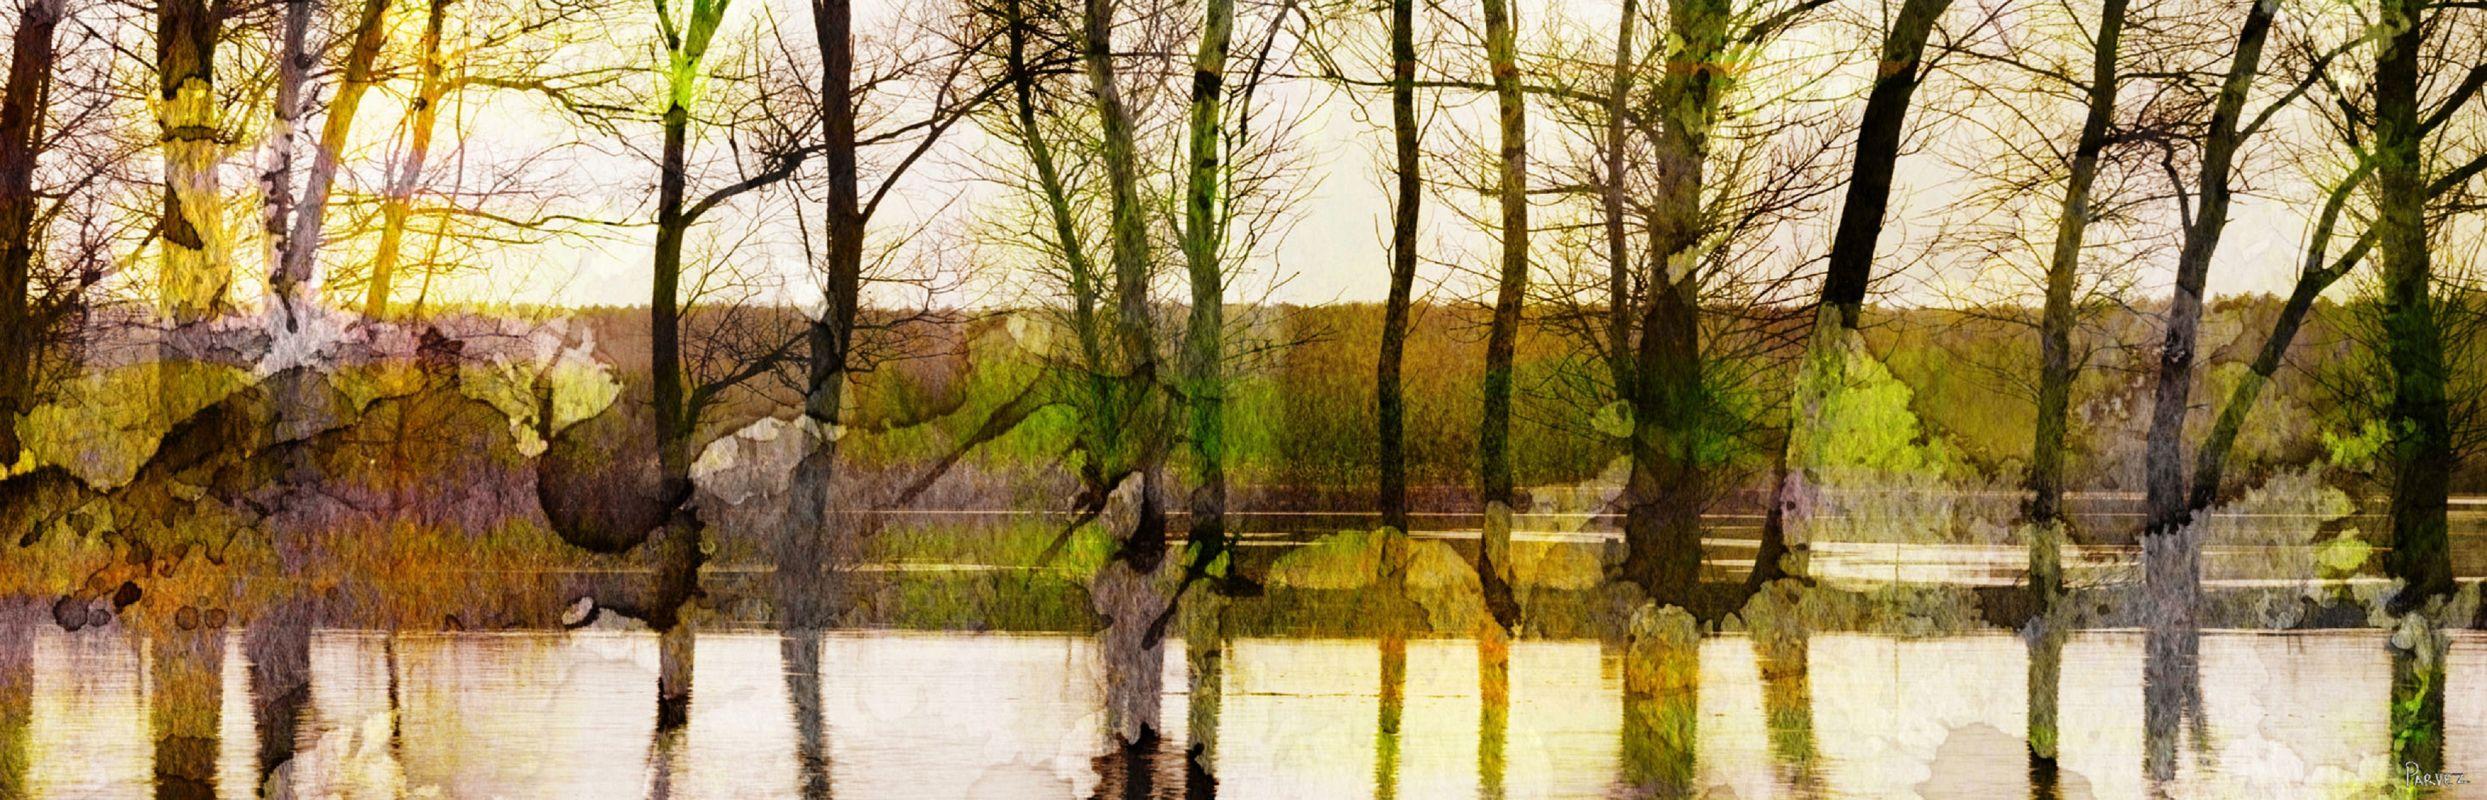 Parvez Taj Lake Trees Art Print on Premium Canvas 10 x 30 Home Decor